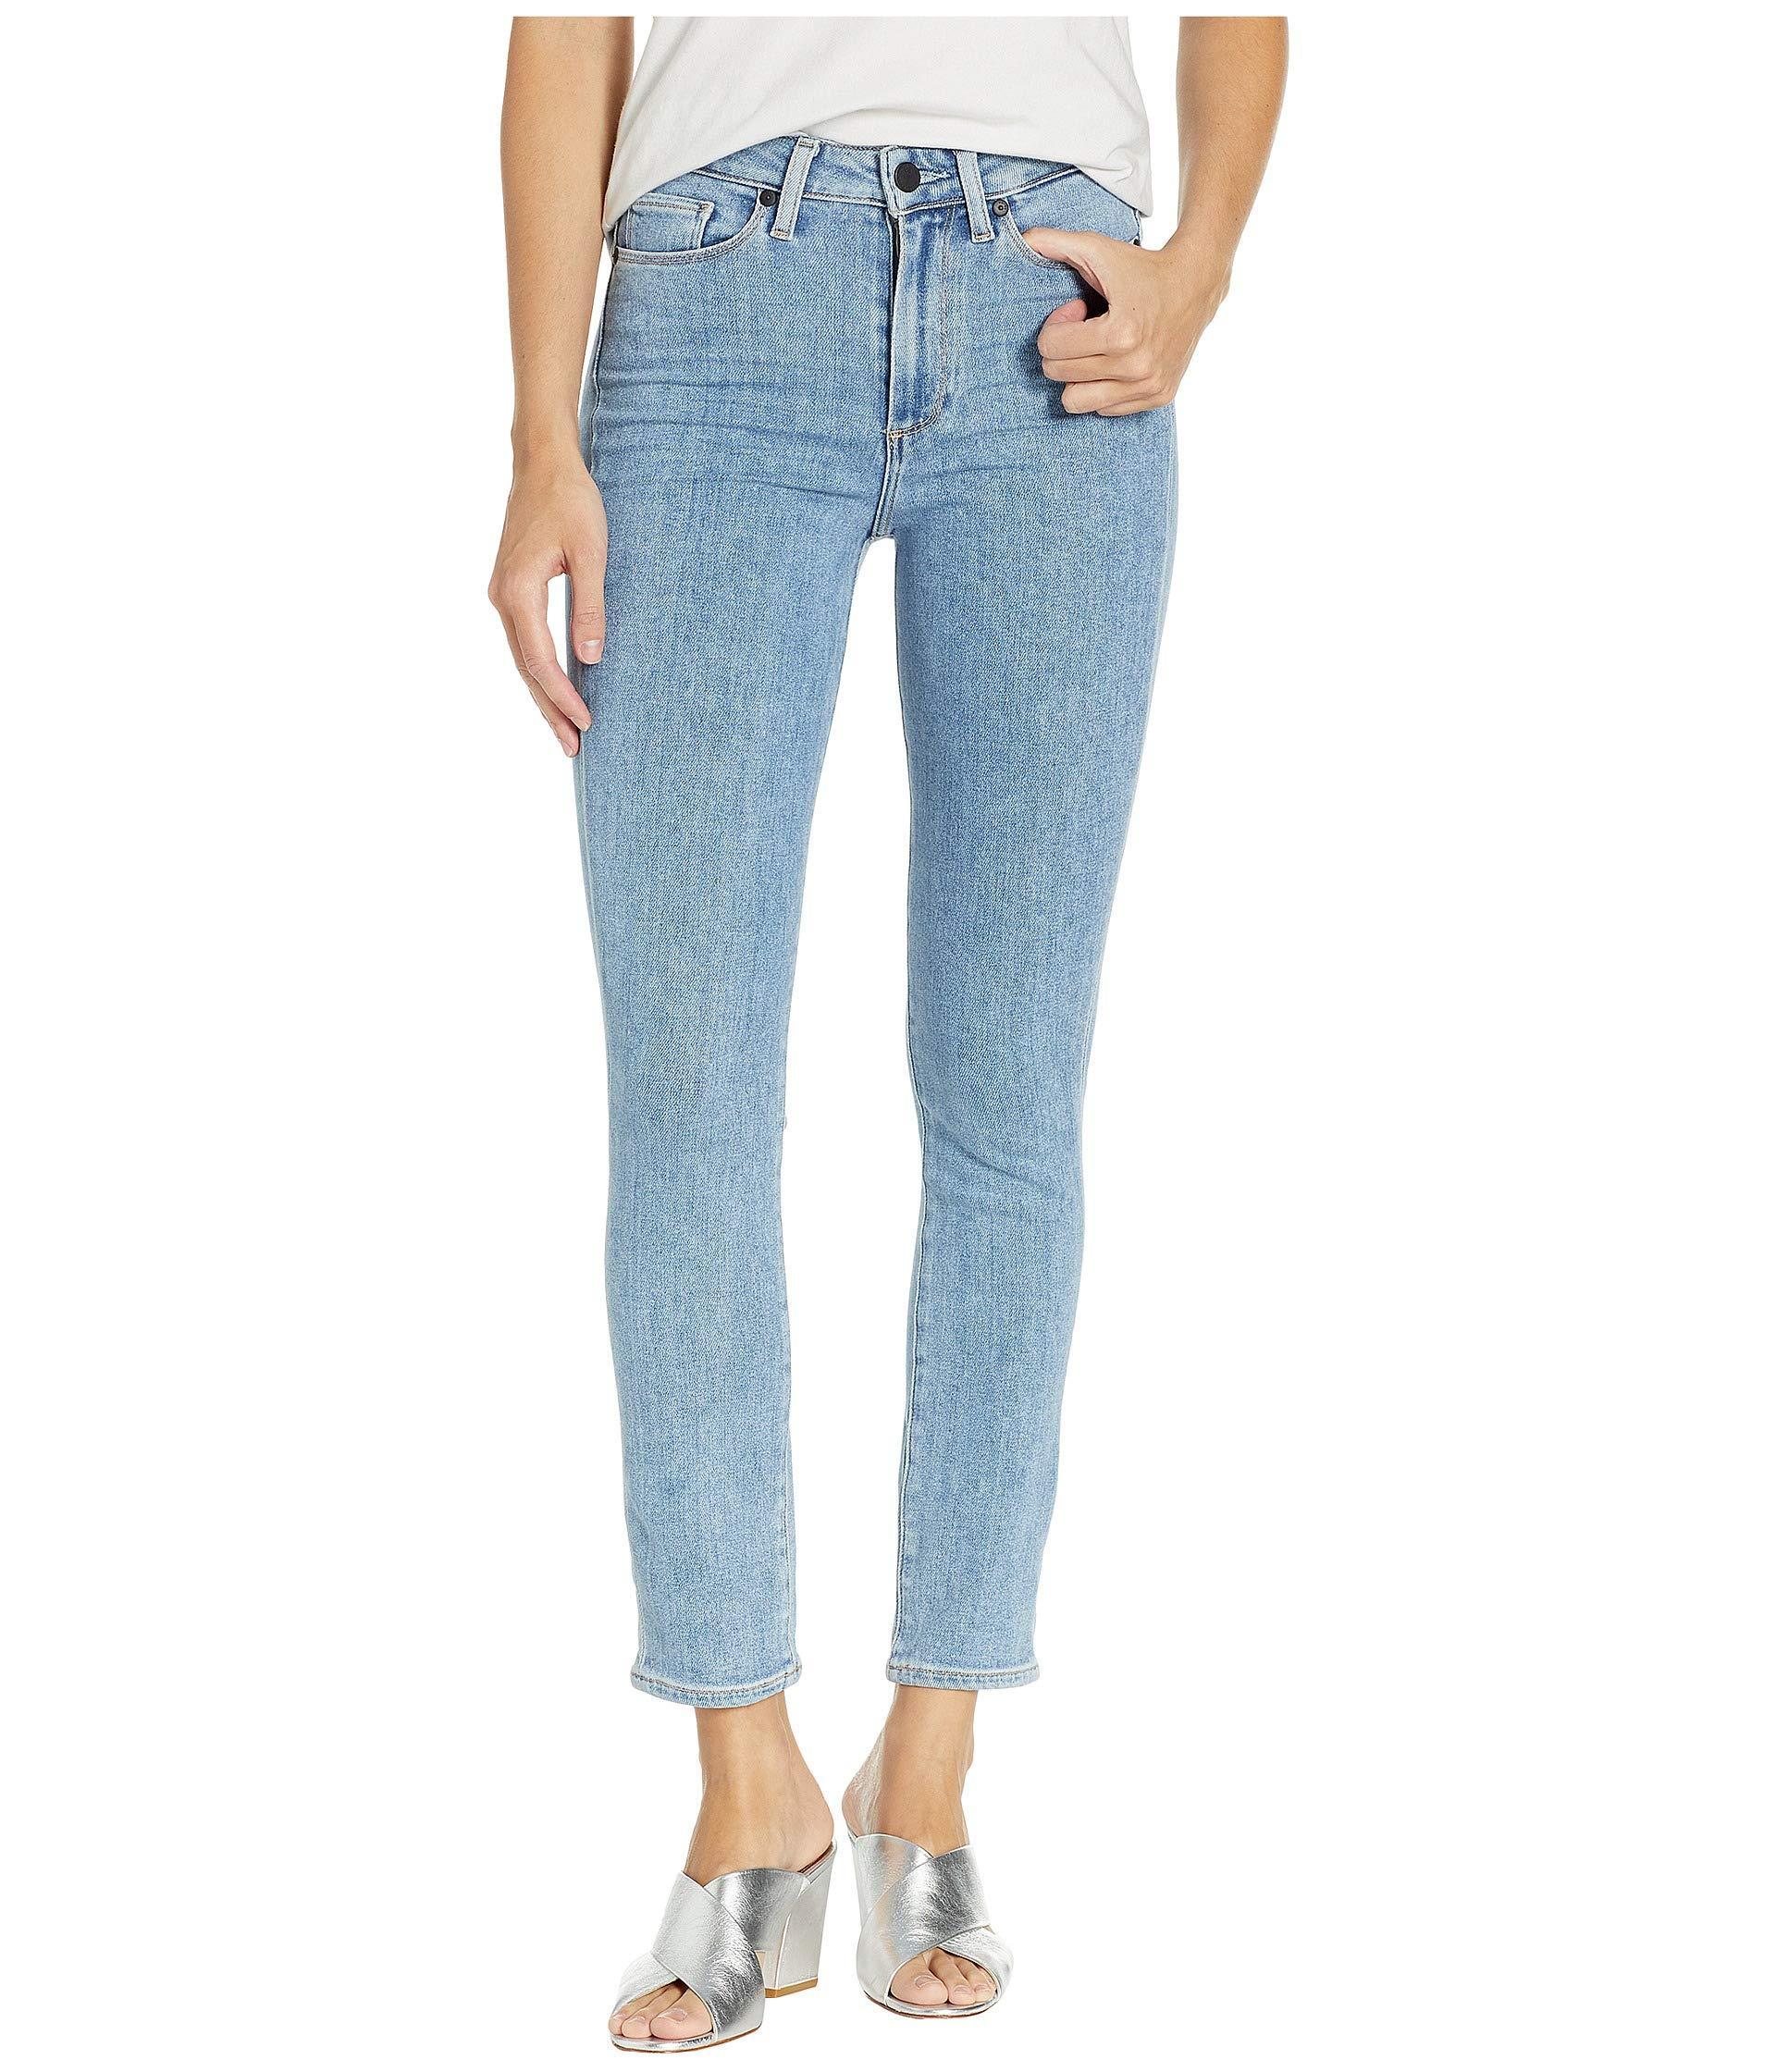 e1354b1408 Lyst - PAIGE Margot Ankle Peg In Miami (miami) Women's Jeans in Blue